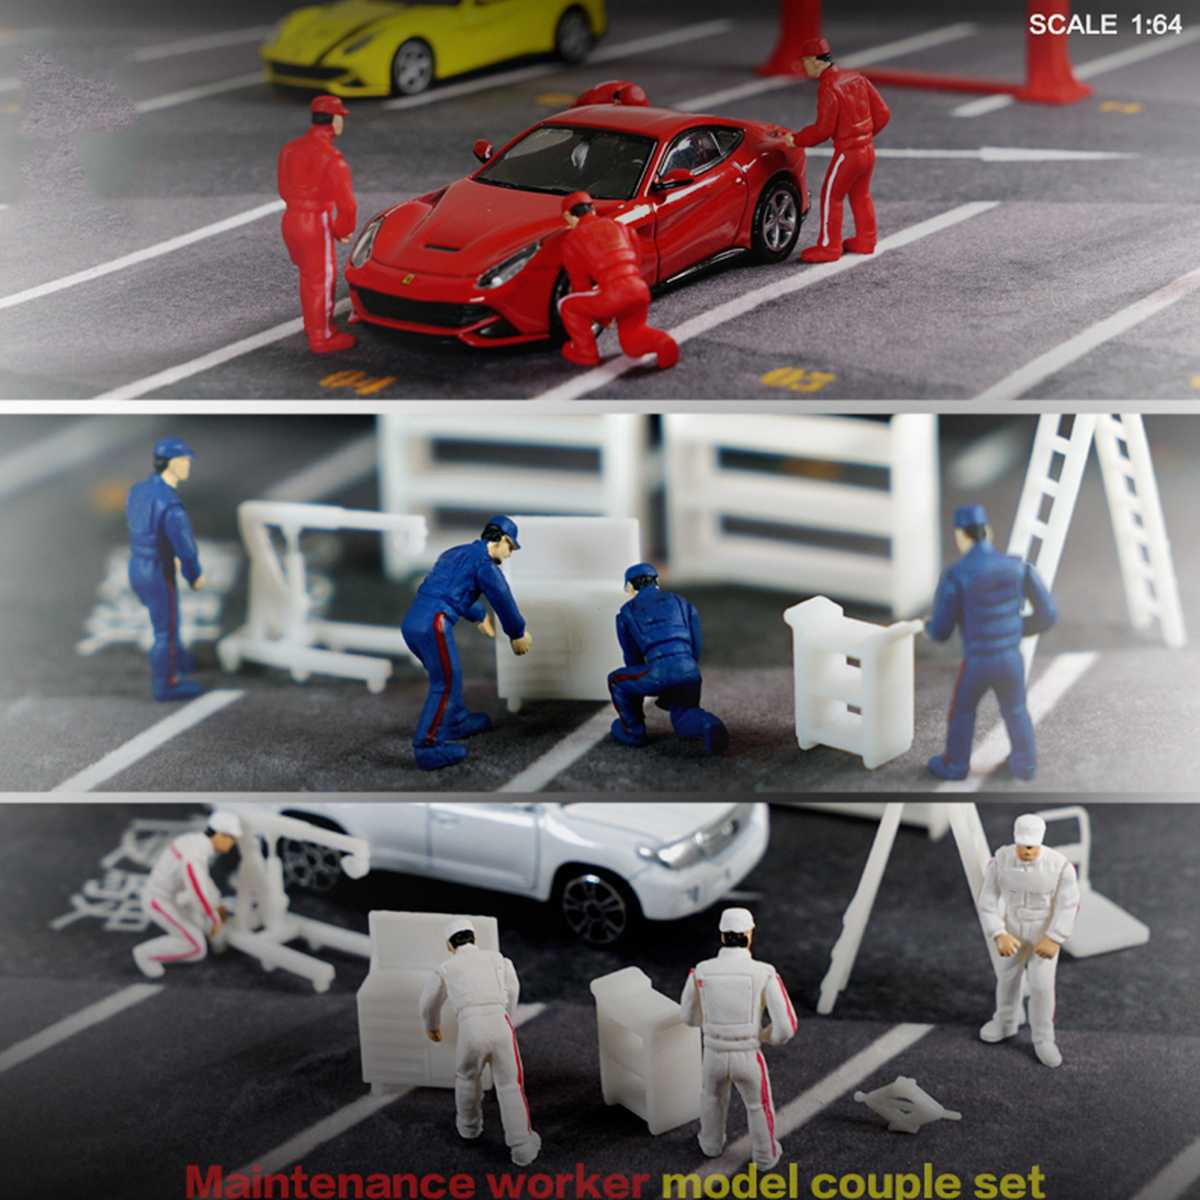 1:64 Auto Repairing People Men For Race Medal Technician Repairing Scenario Model Matchbox Technician Repairing People Toy